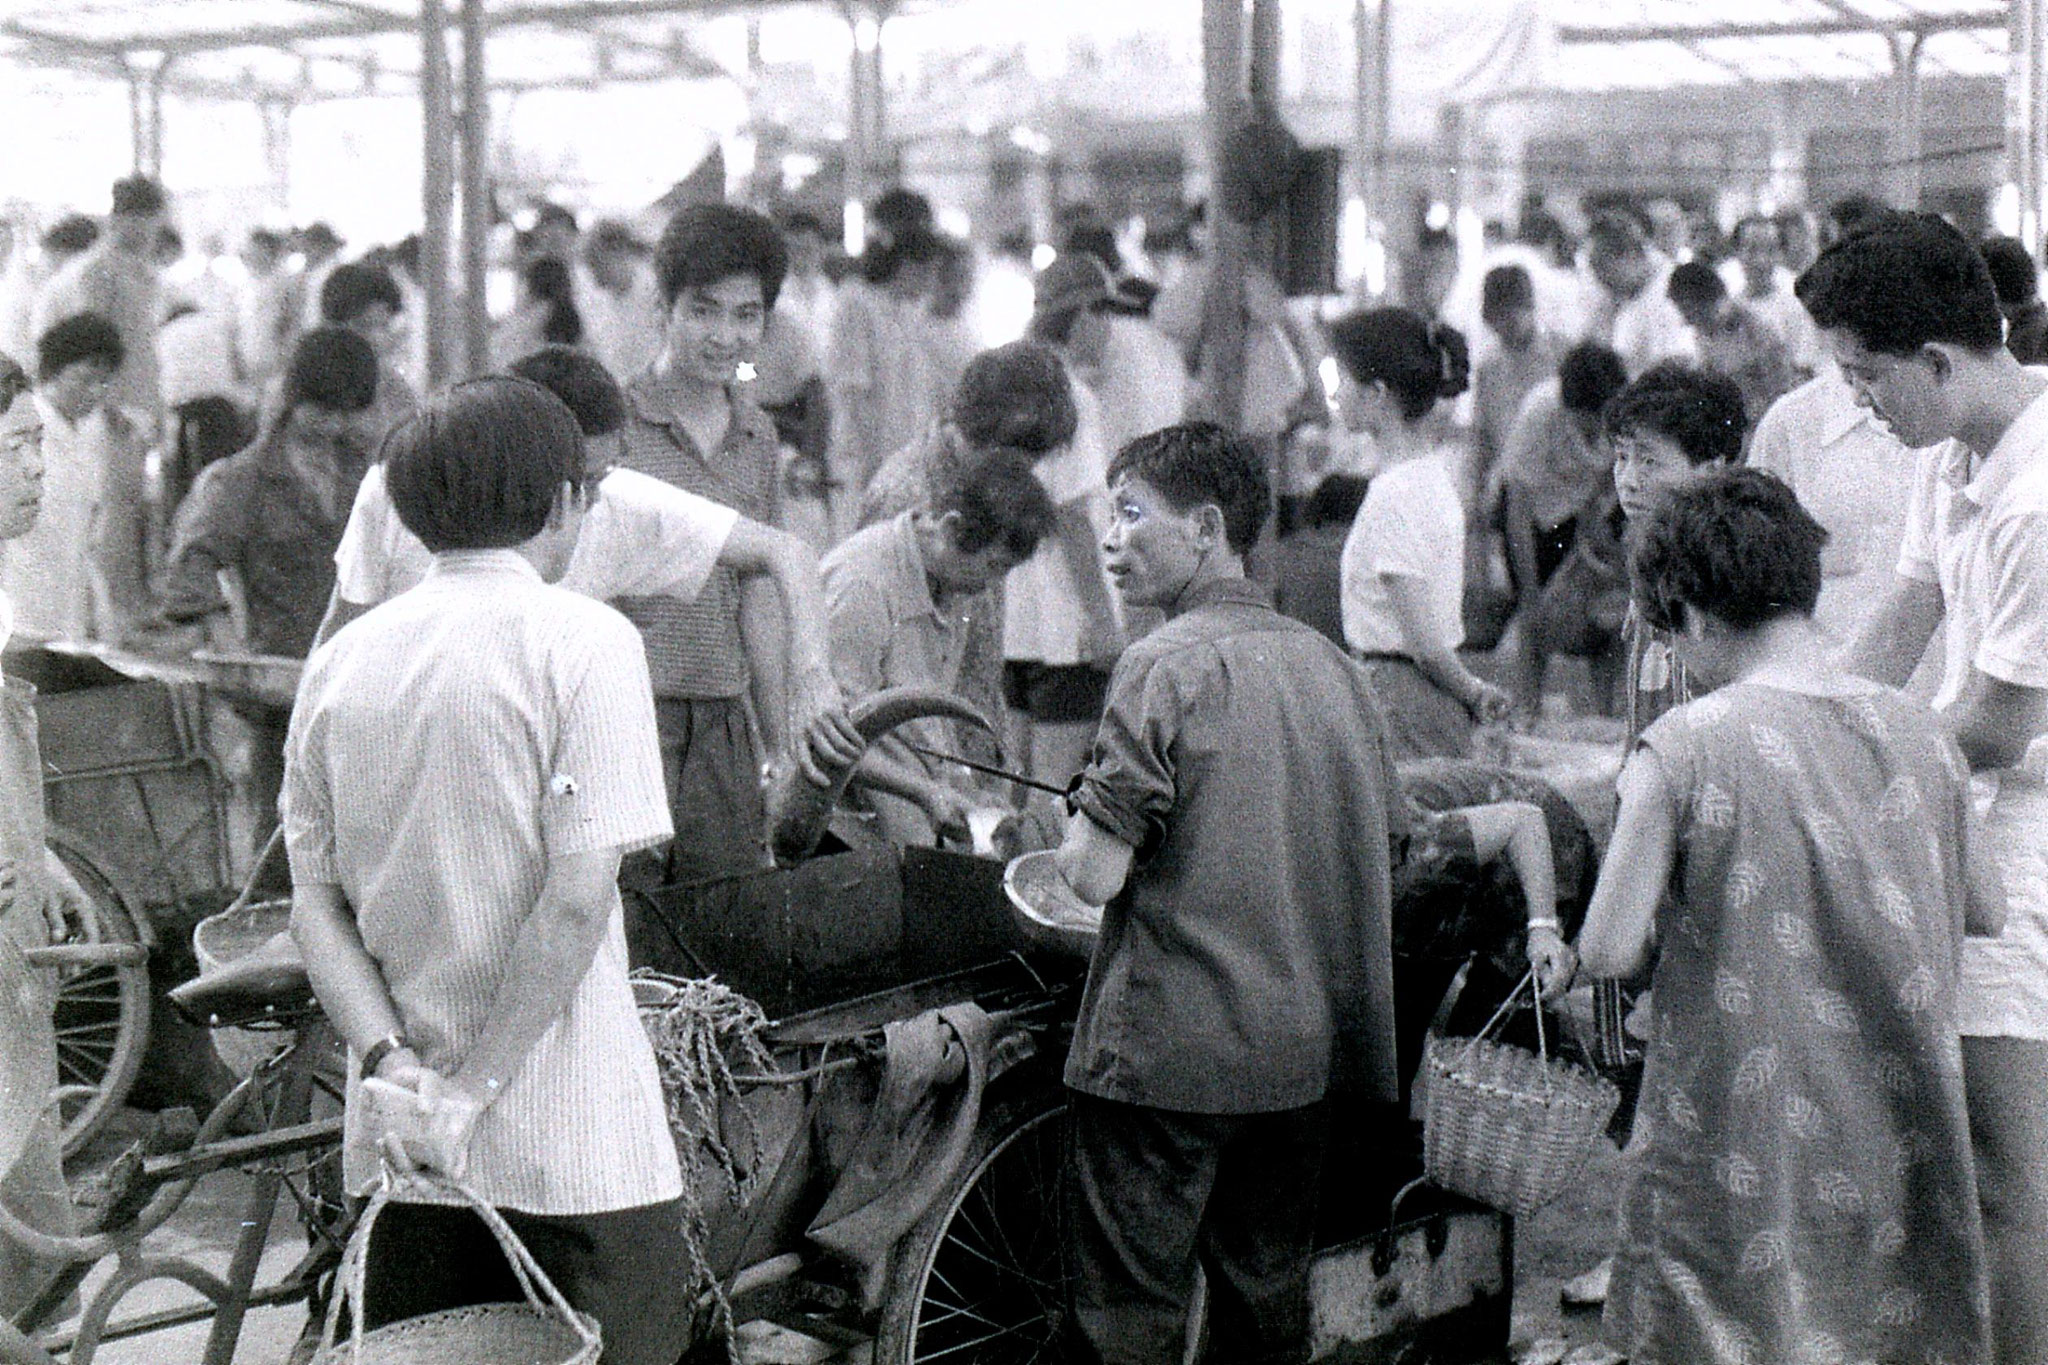 19/7/1989: 30: Zheda Free market